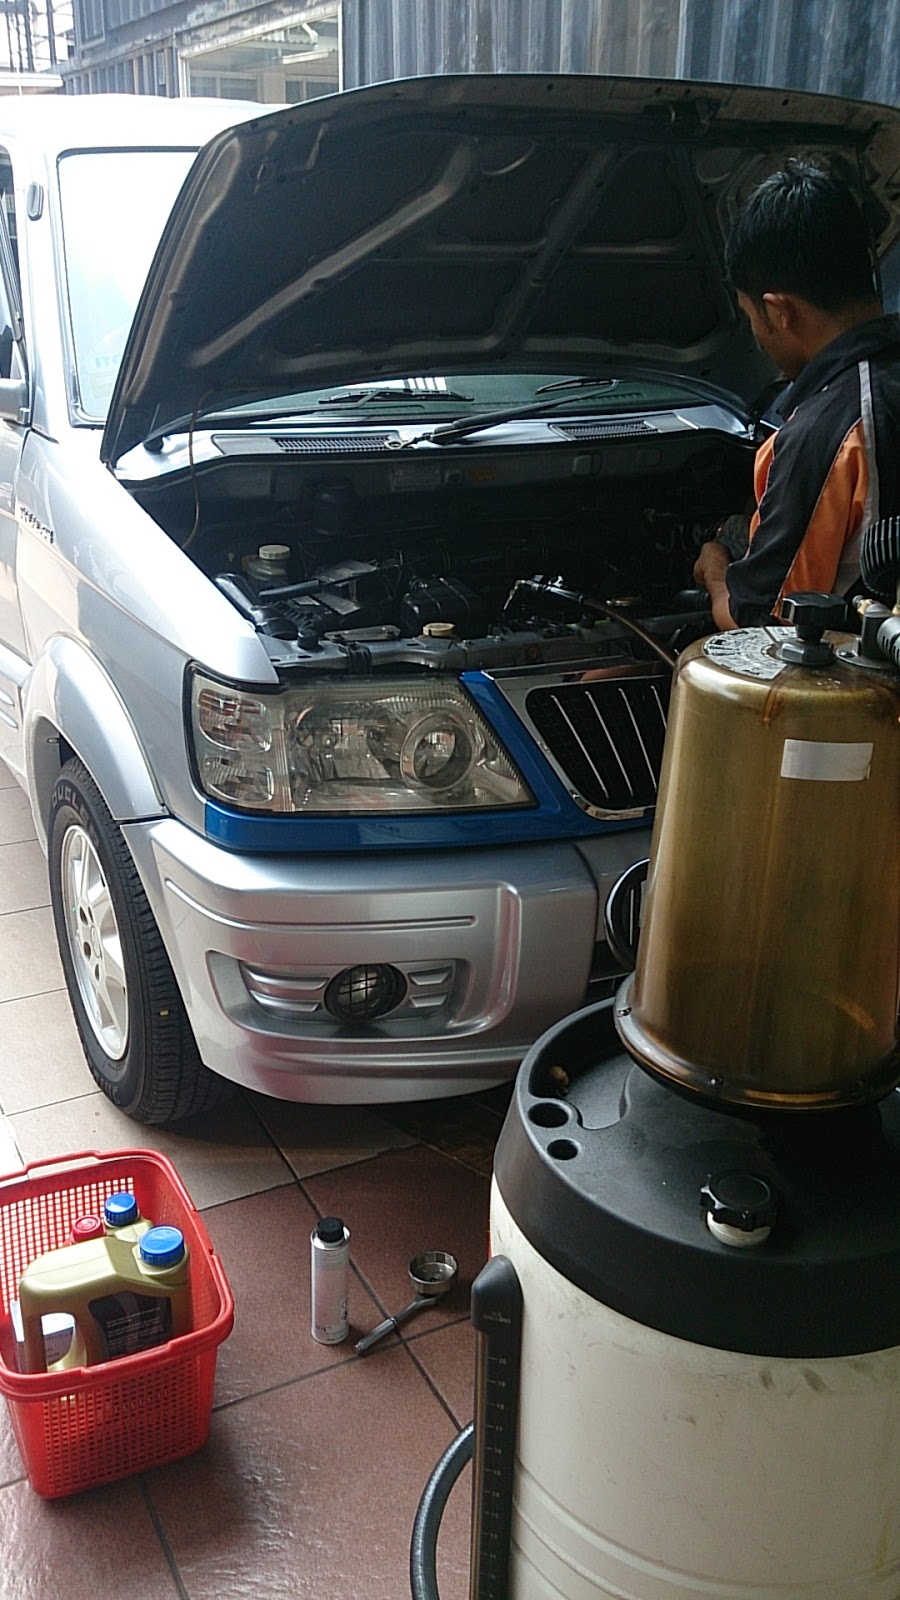 Kumpulan DO IT YOURSELF Otomotif: Tips ... Ganti Oli Mesin Mitsubishi KUDA, sekaligus mencoba ...